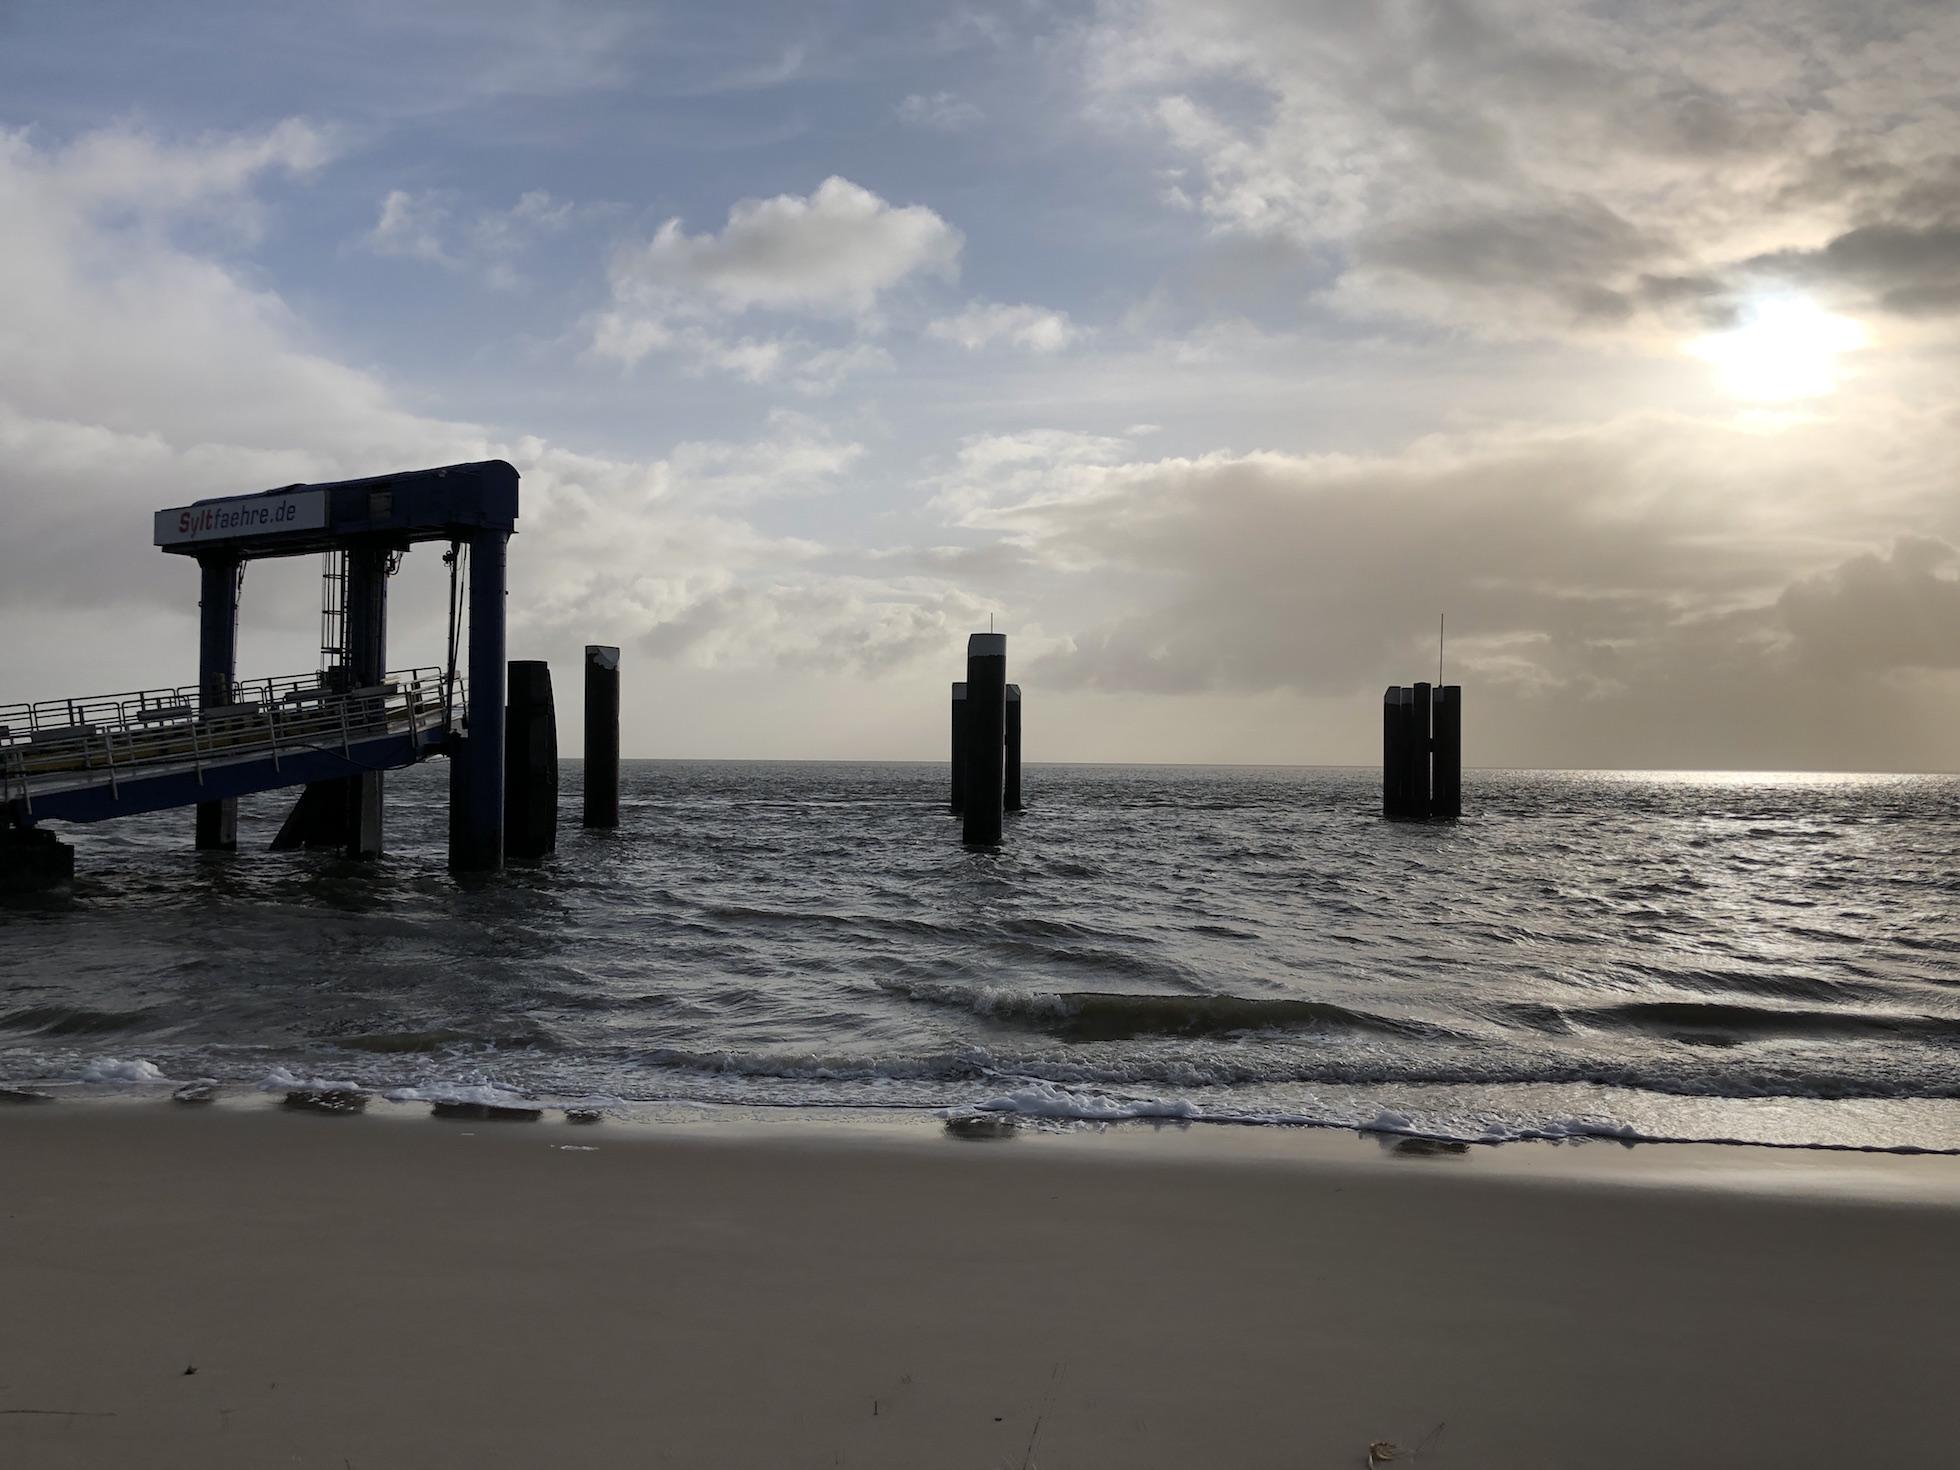 Nordsee, Nordfriesland, Sylt, List, Faehranleger, Meer und Sonne